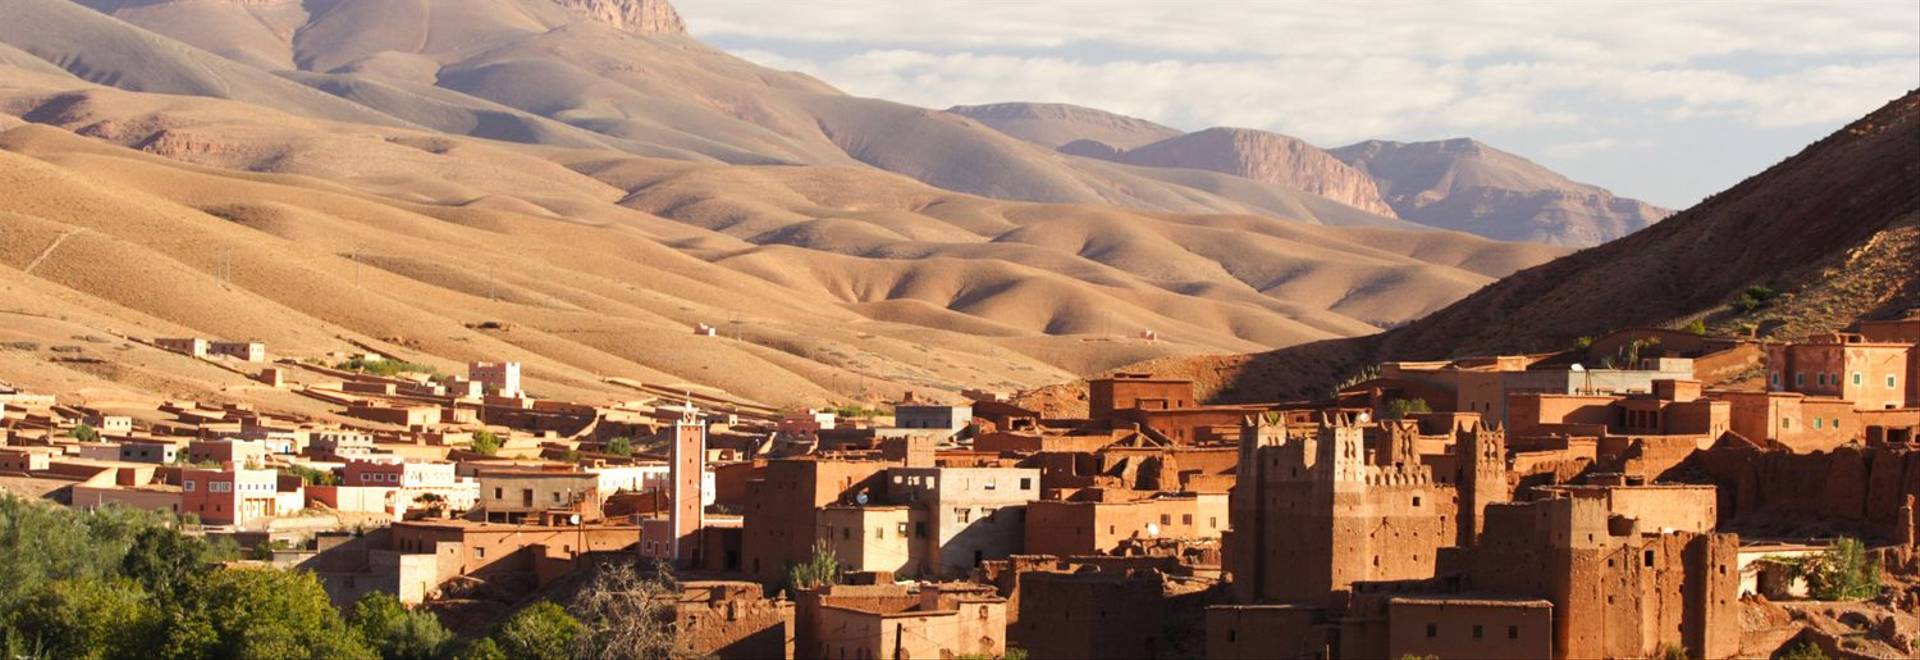 DT Moroccon Village